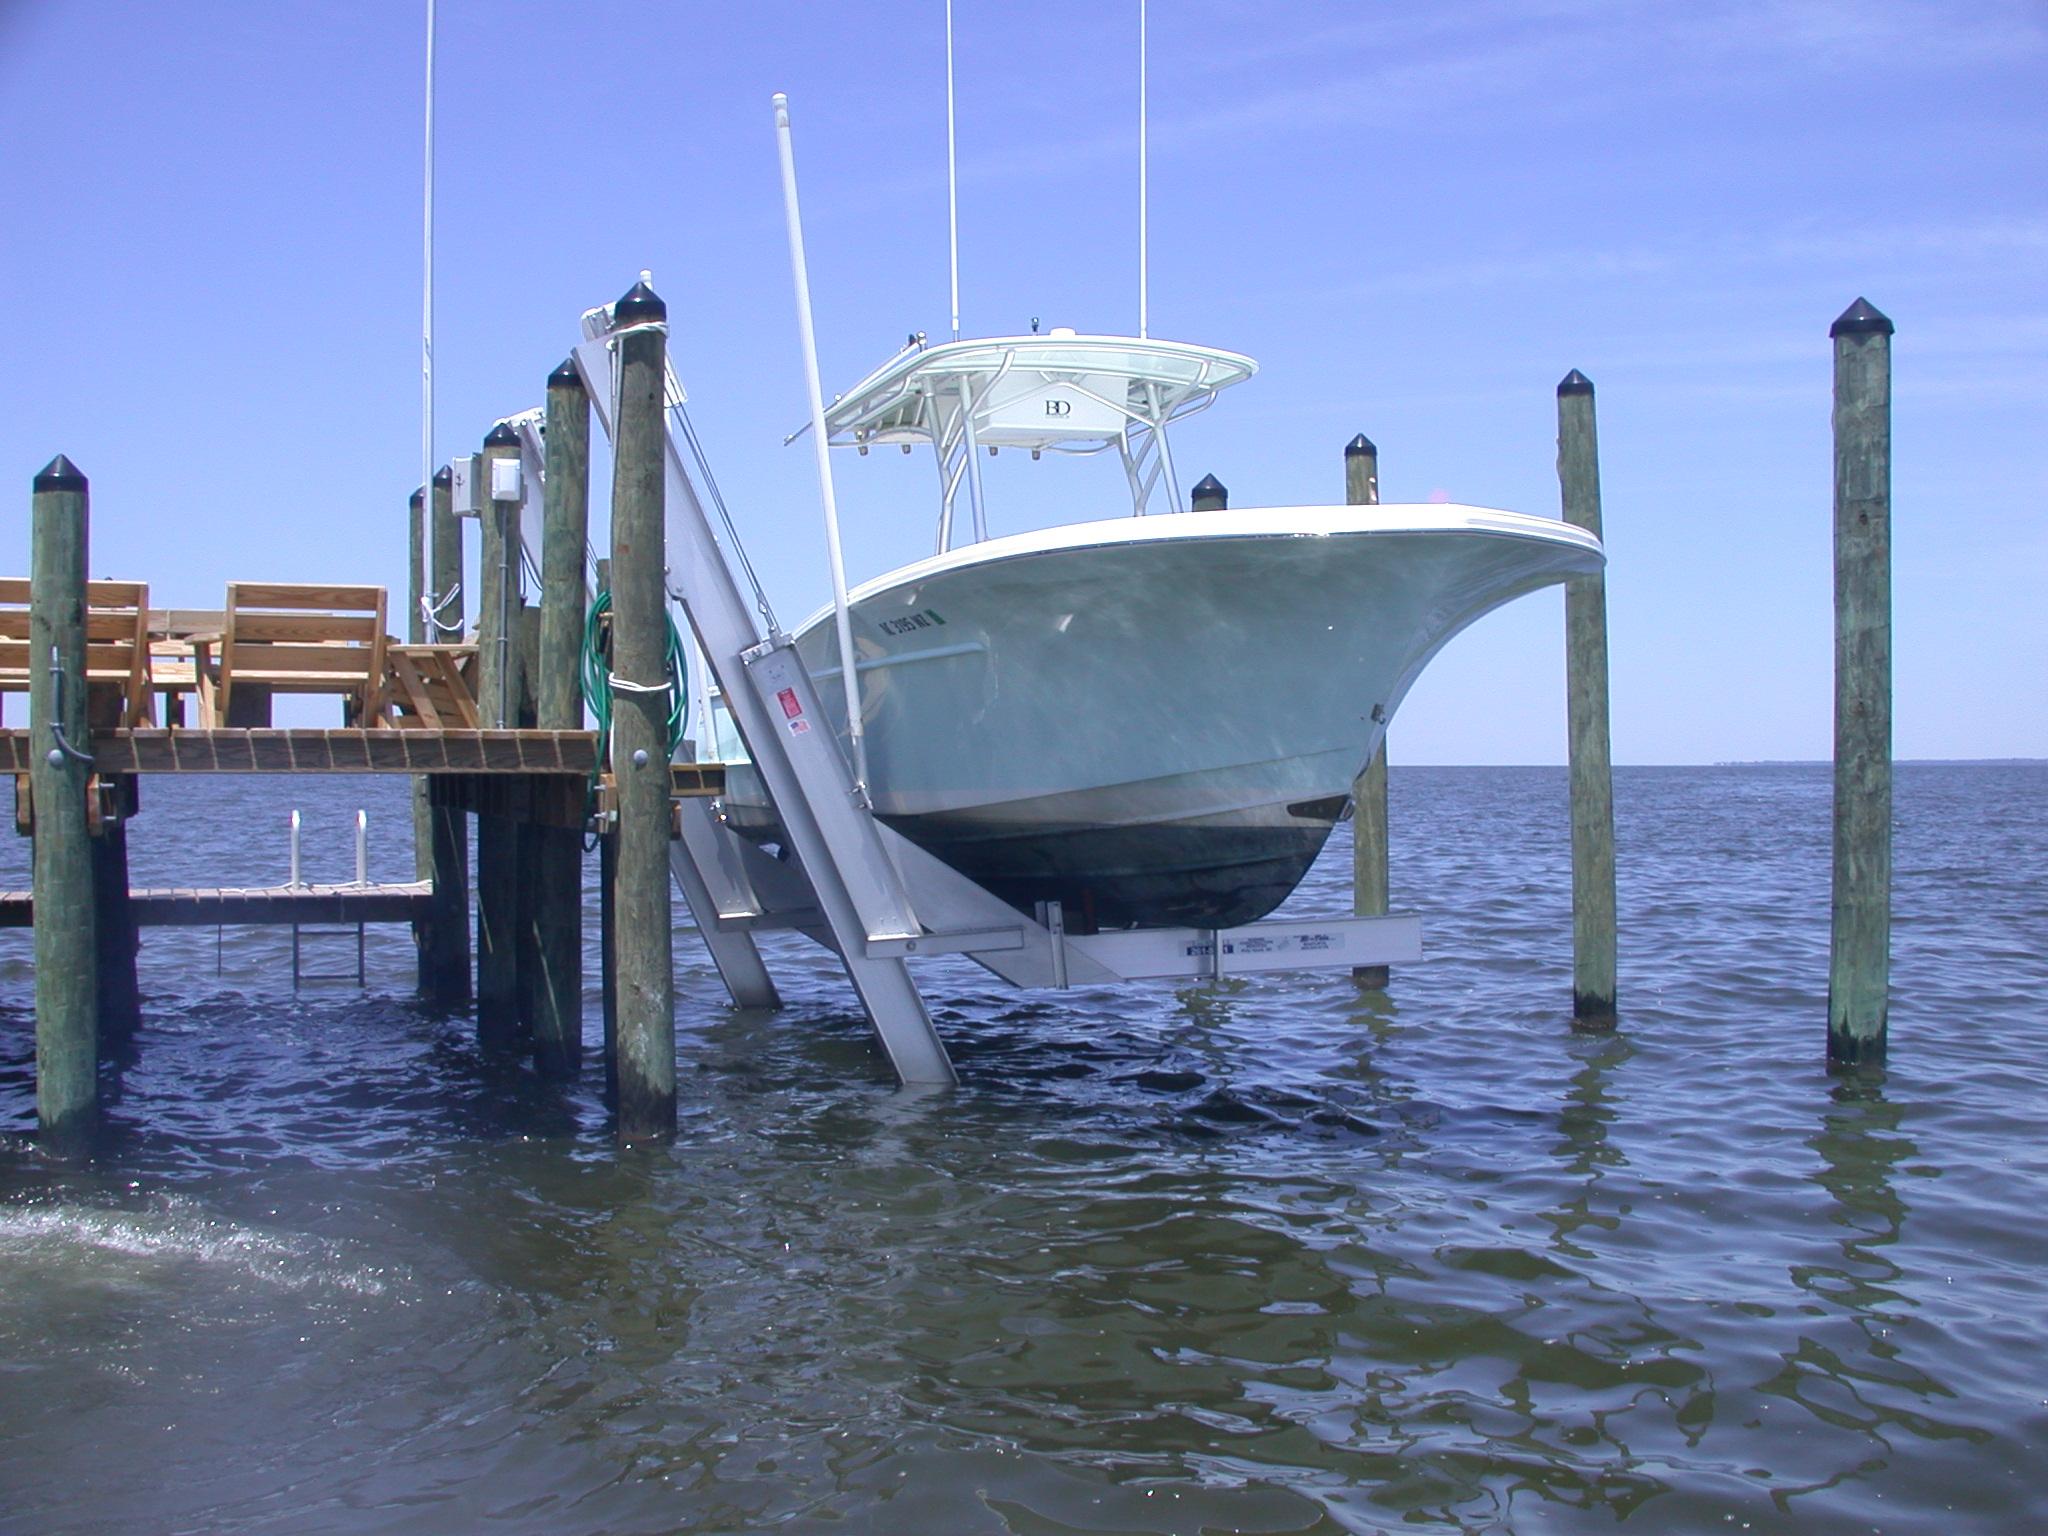 hi-tide-boat-lifts-pwls-5.jpg